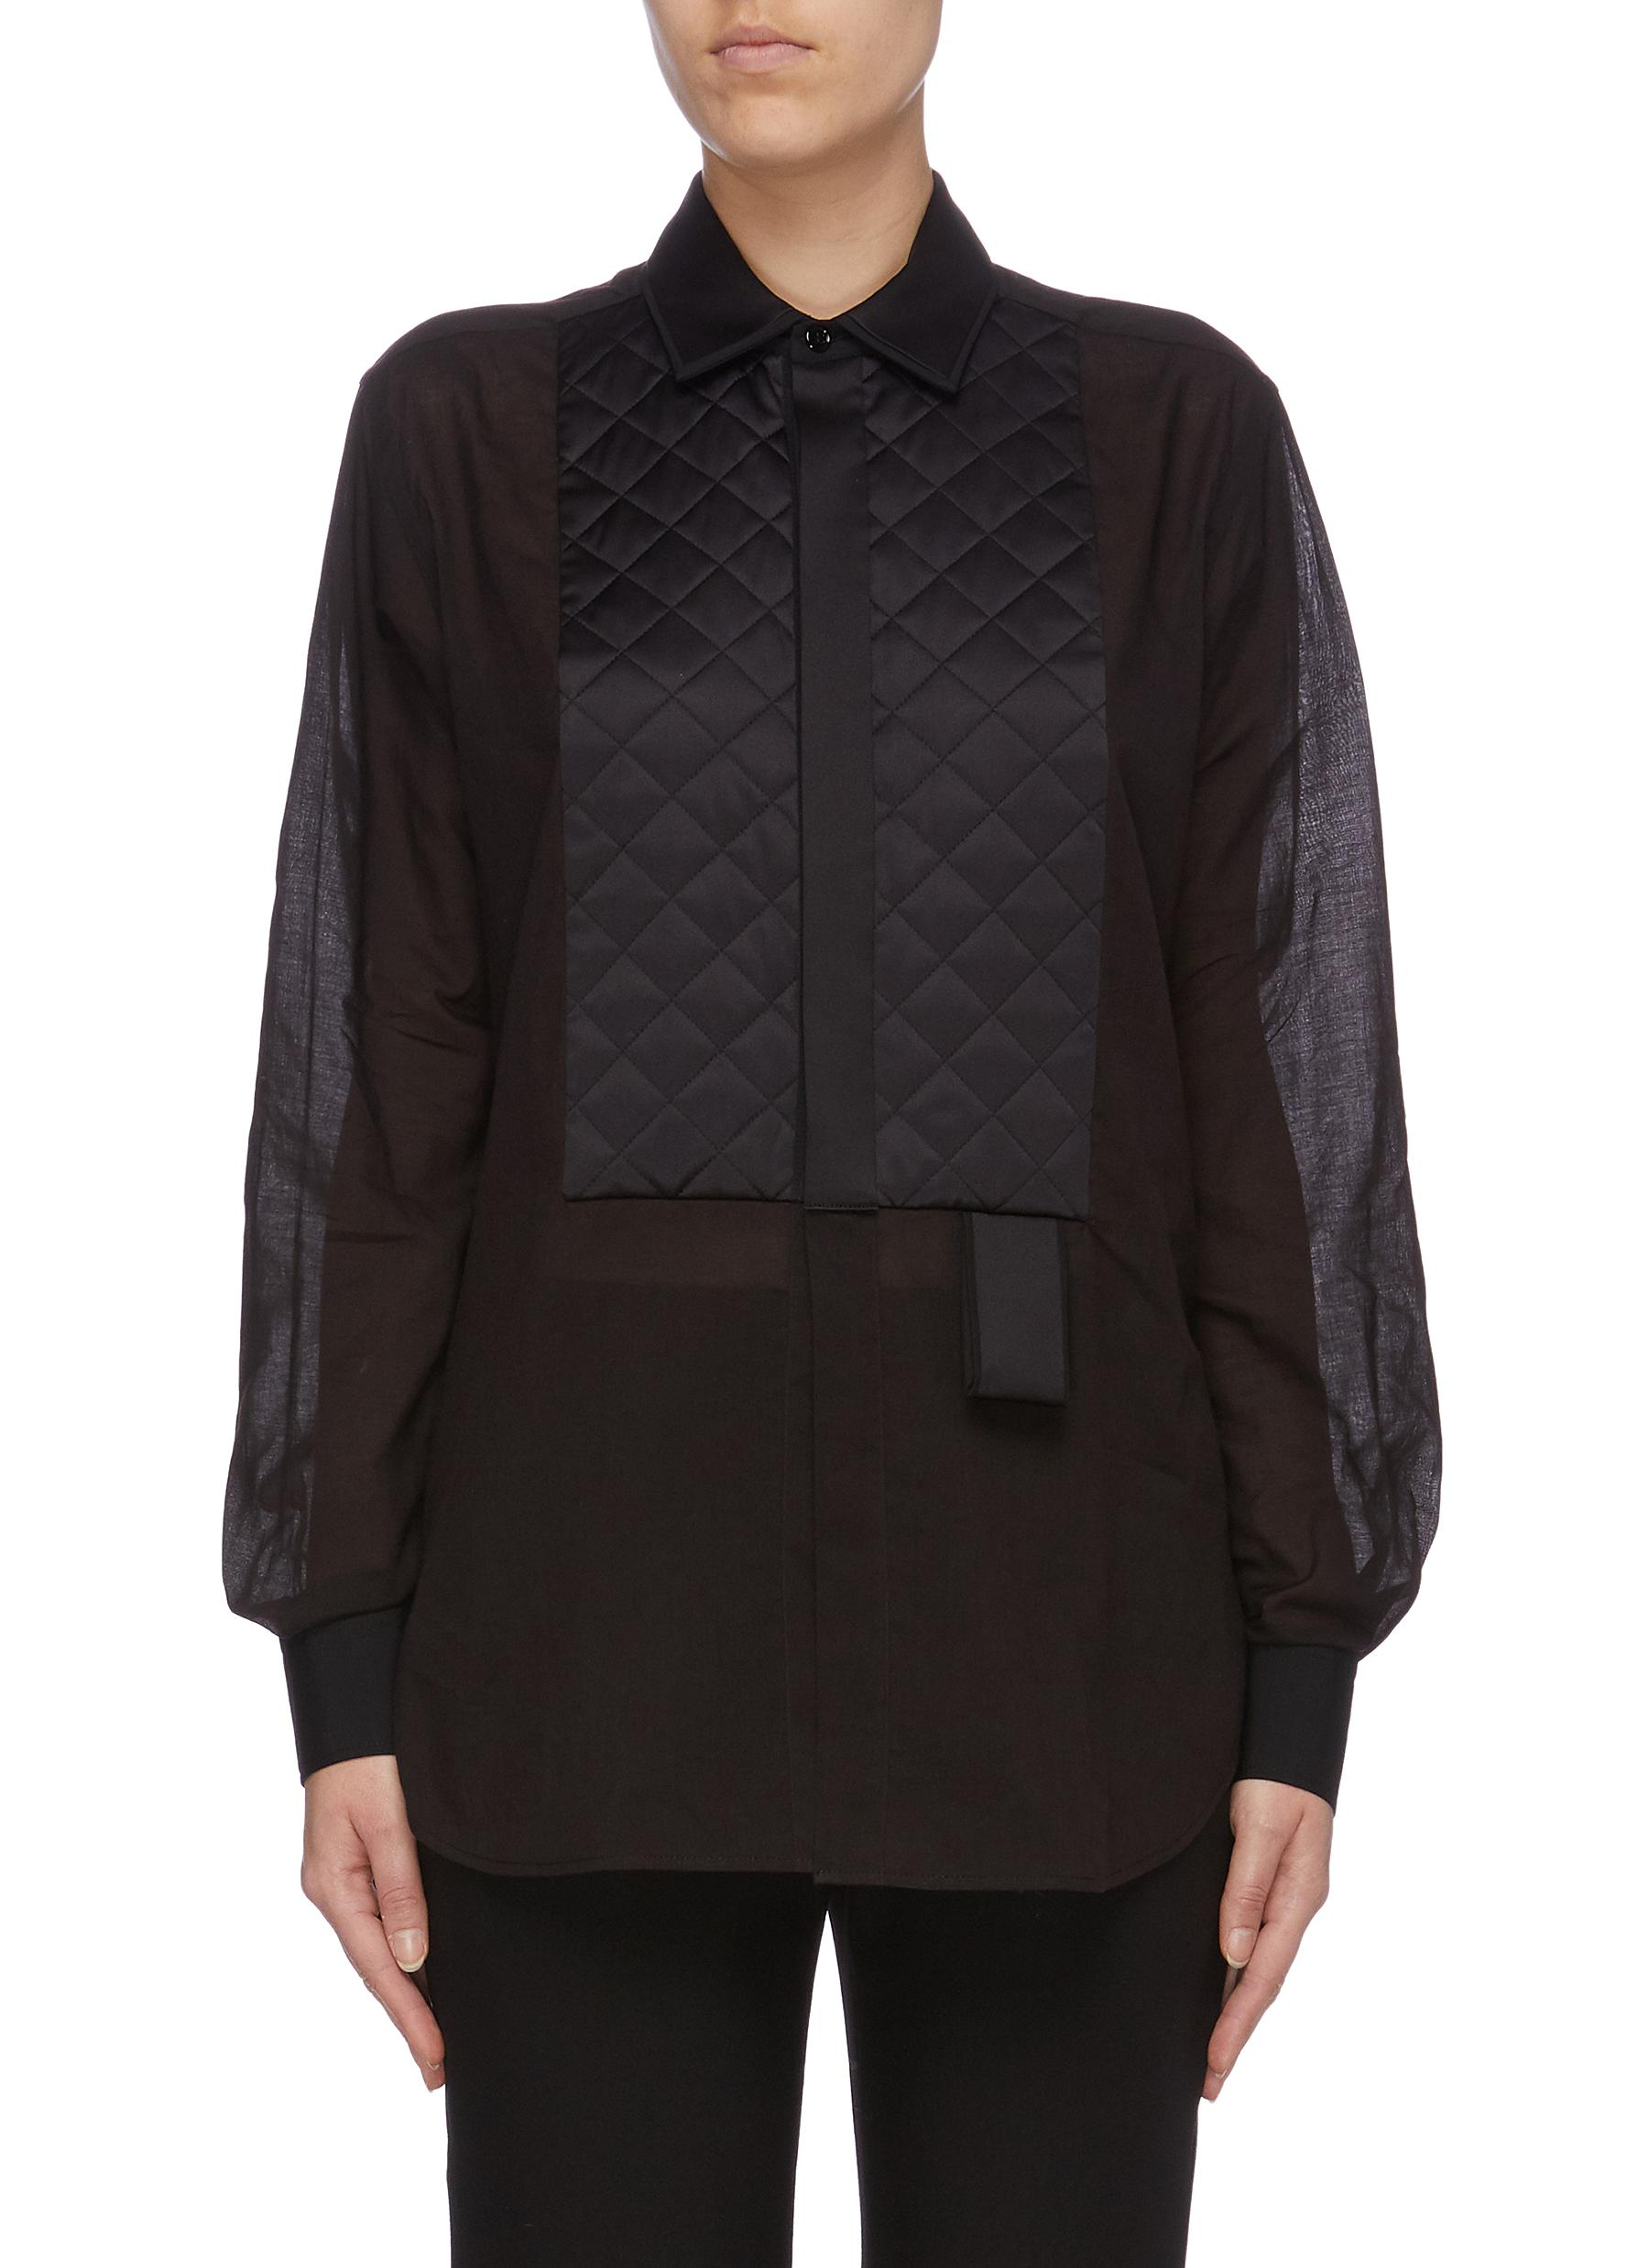 Quilted satin bib voile shirt by Bottega Veneta